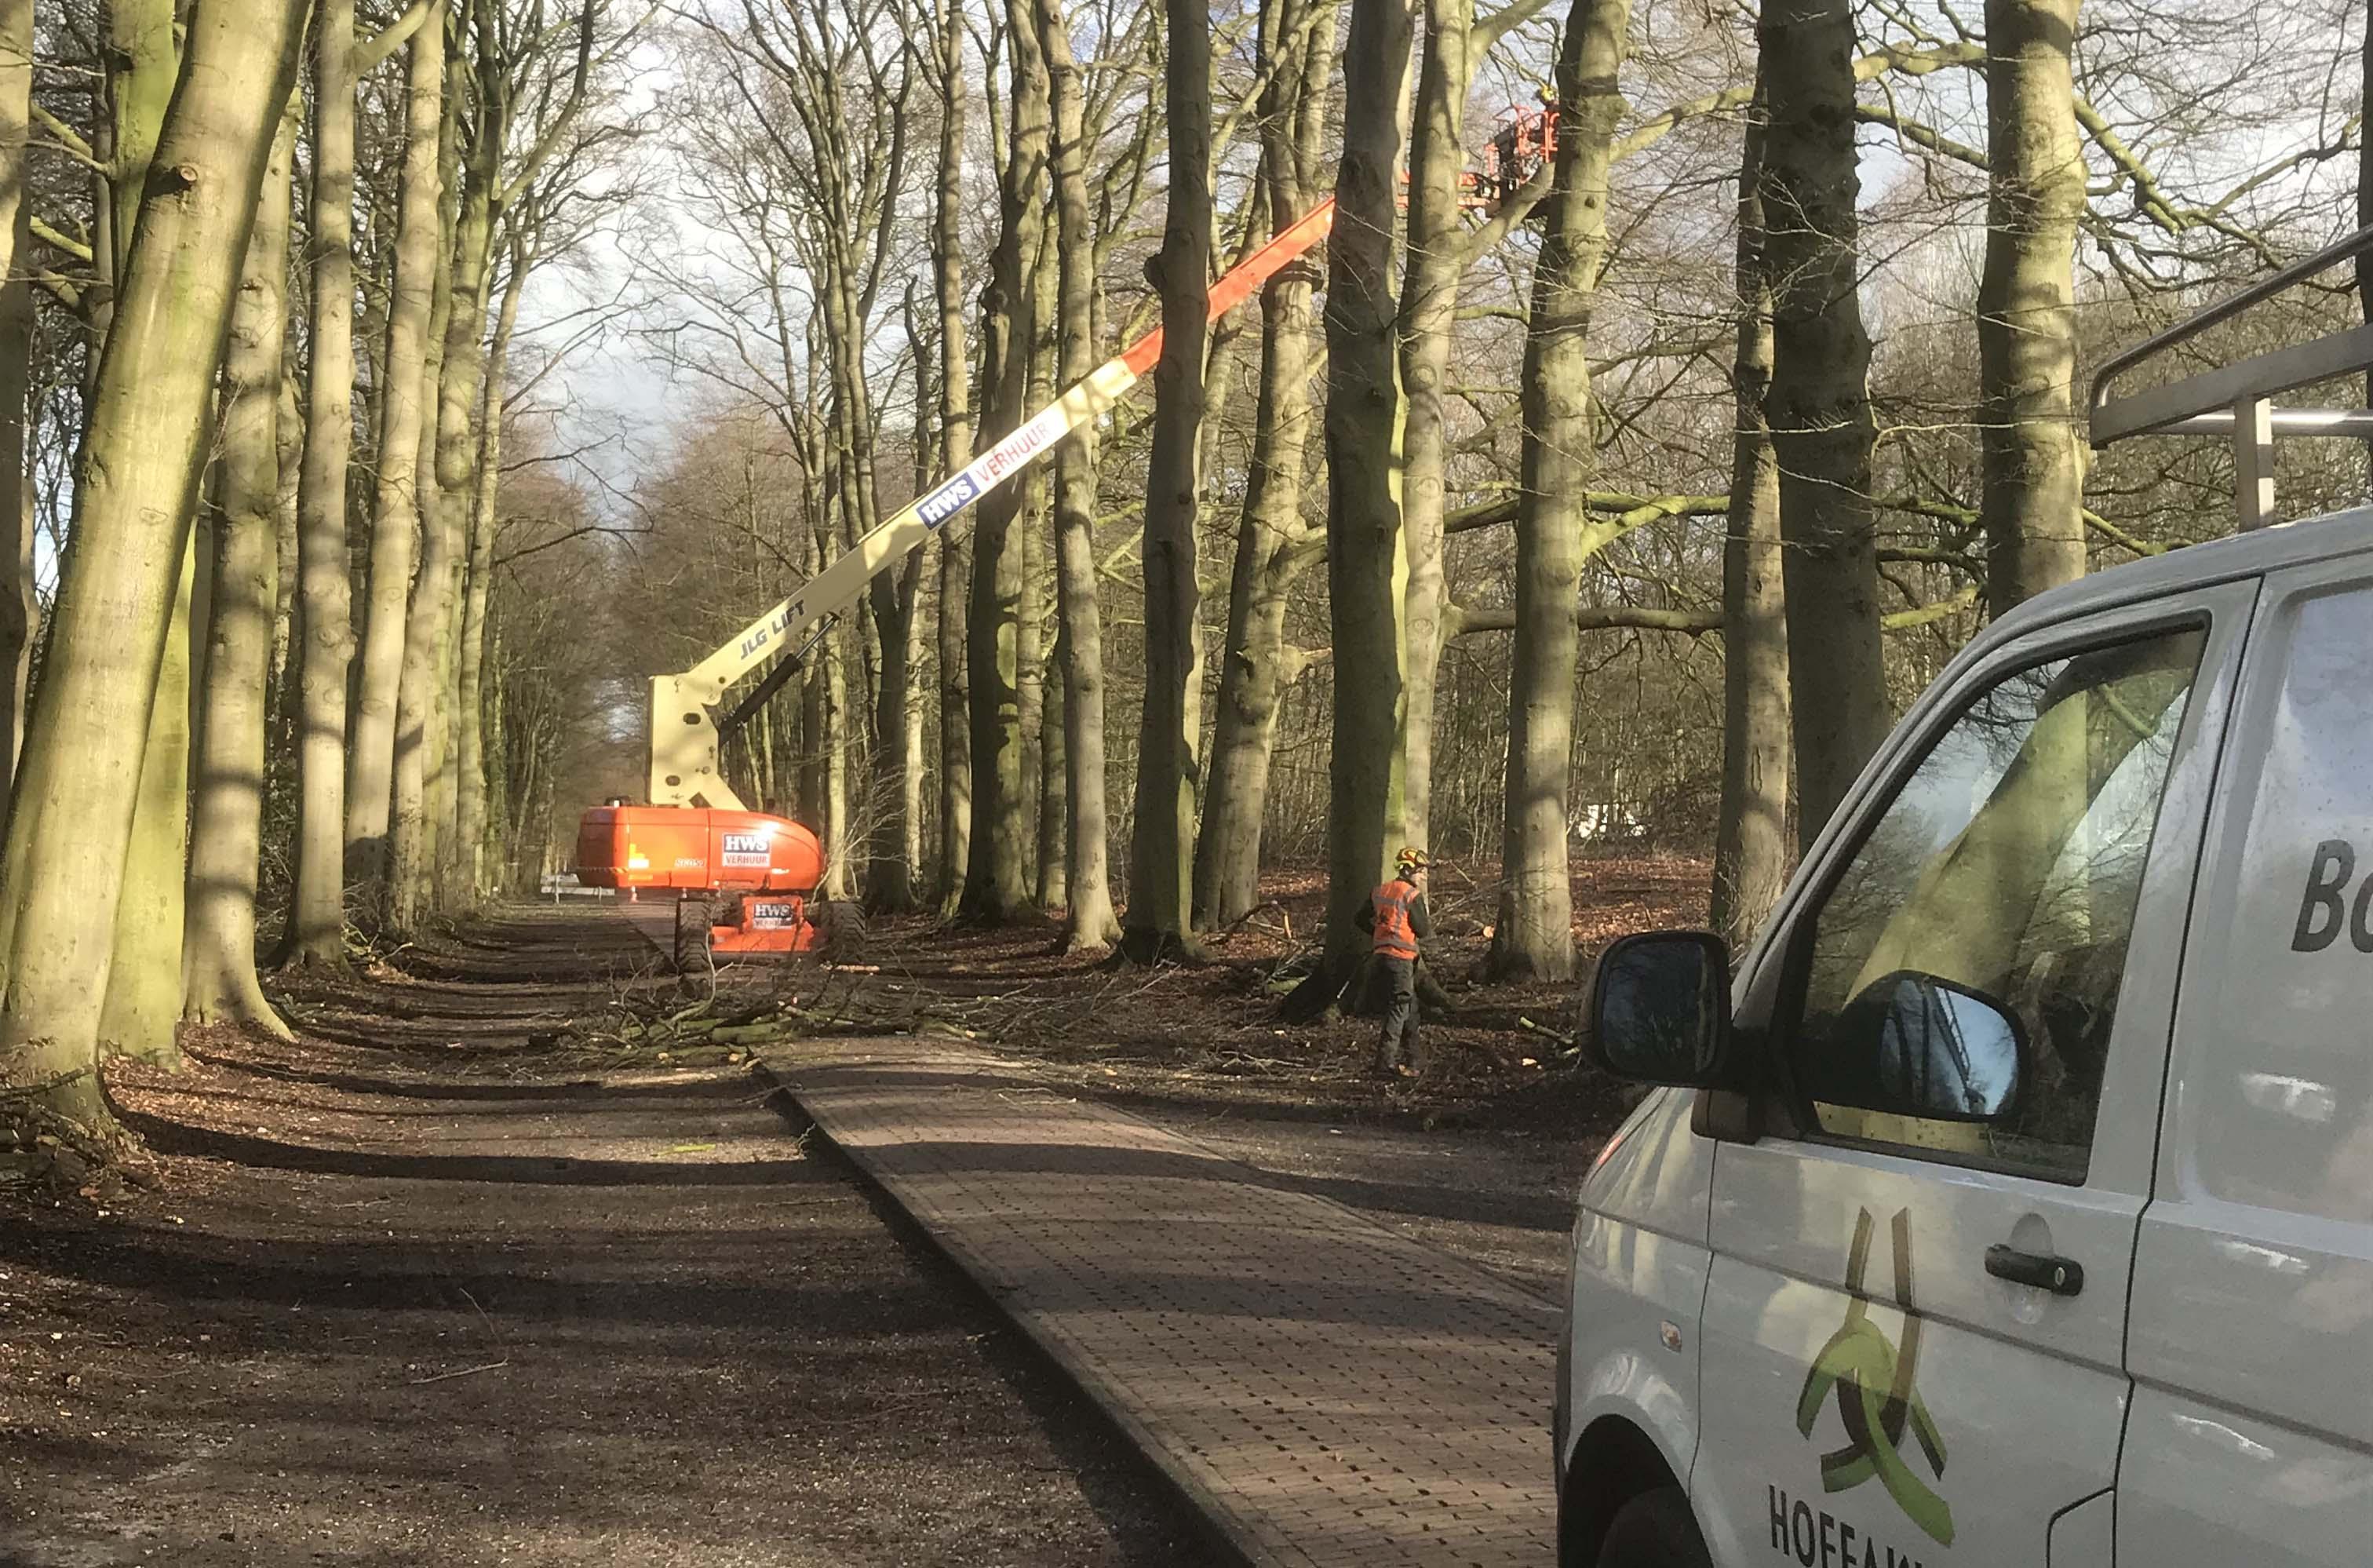 Hoefakker boomspecialisten snoeien monumentale beuken Geldersch Landschap (6m)